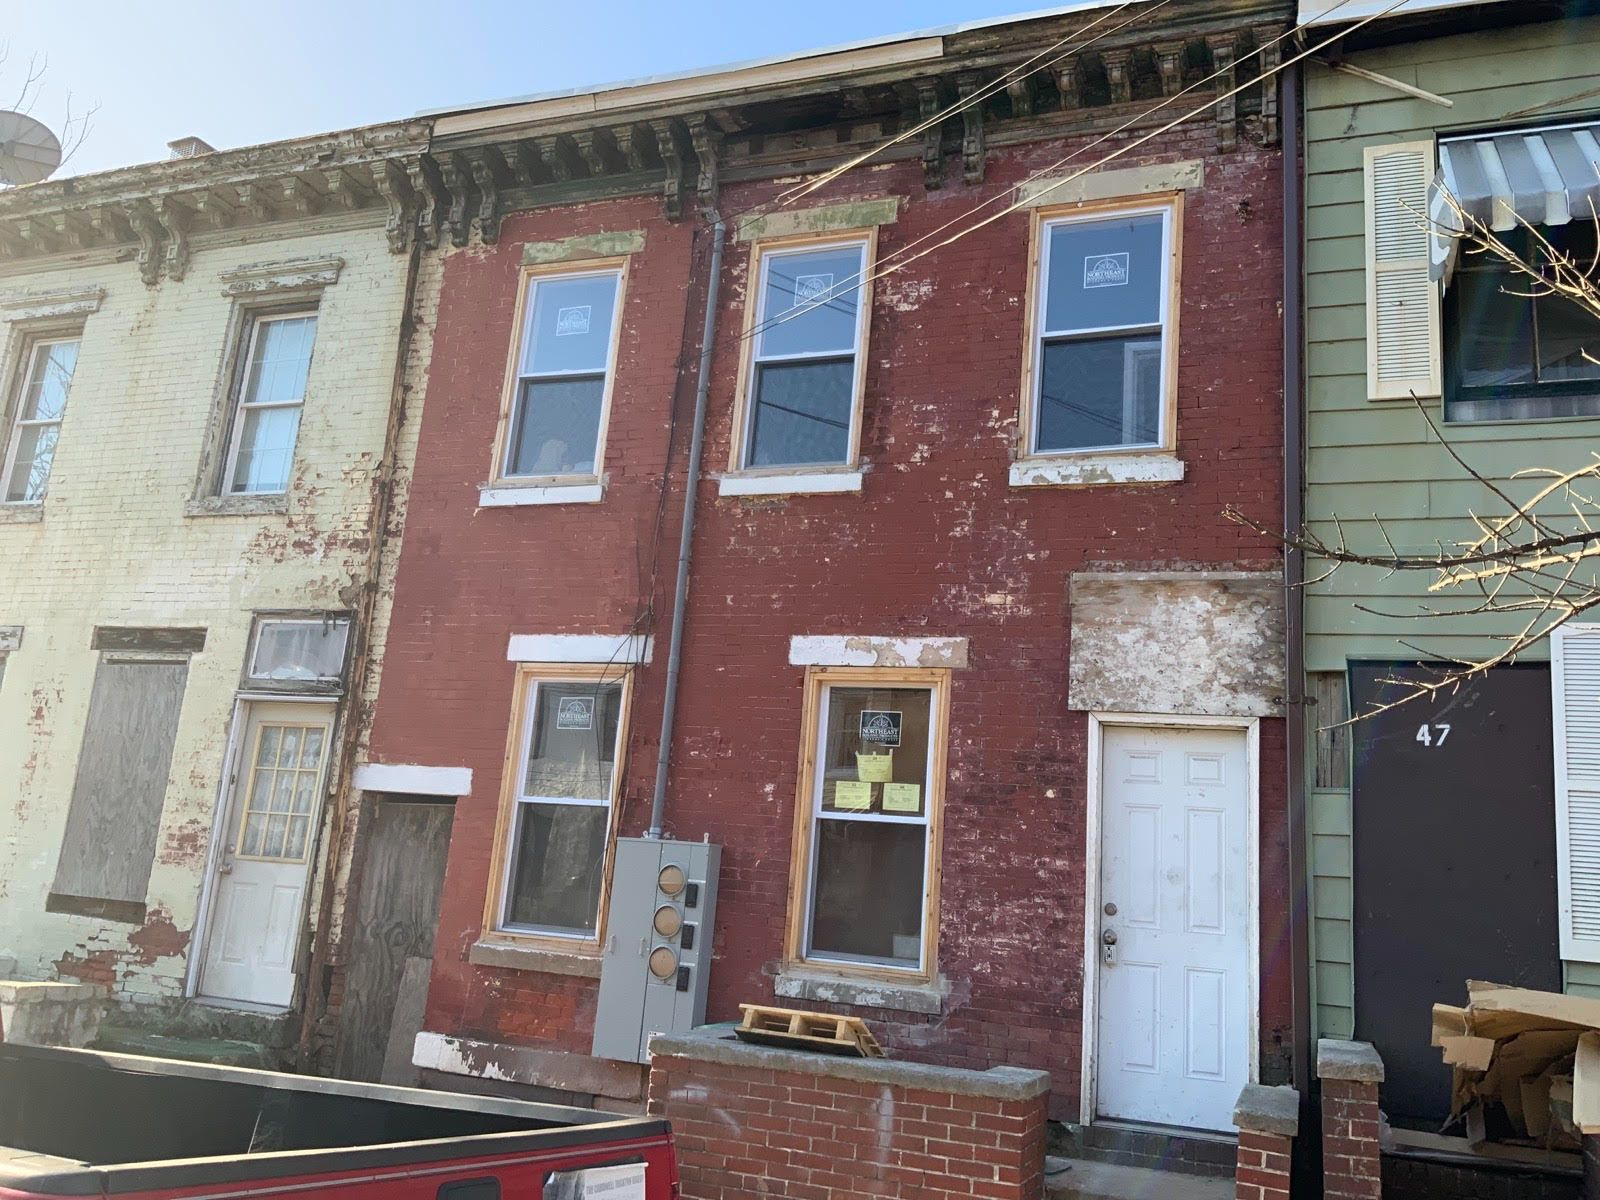 49 Tyrell Ave, Trenton, NJ